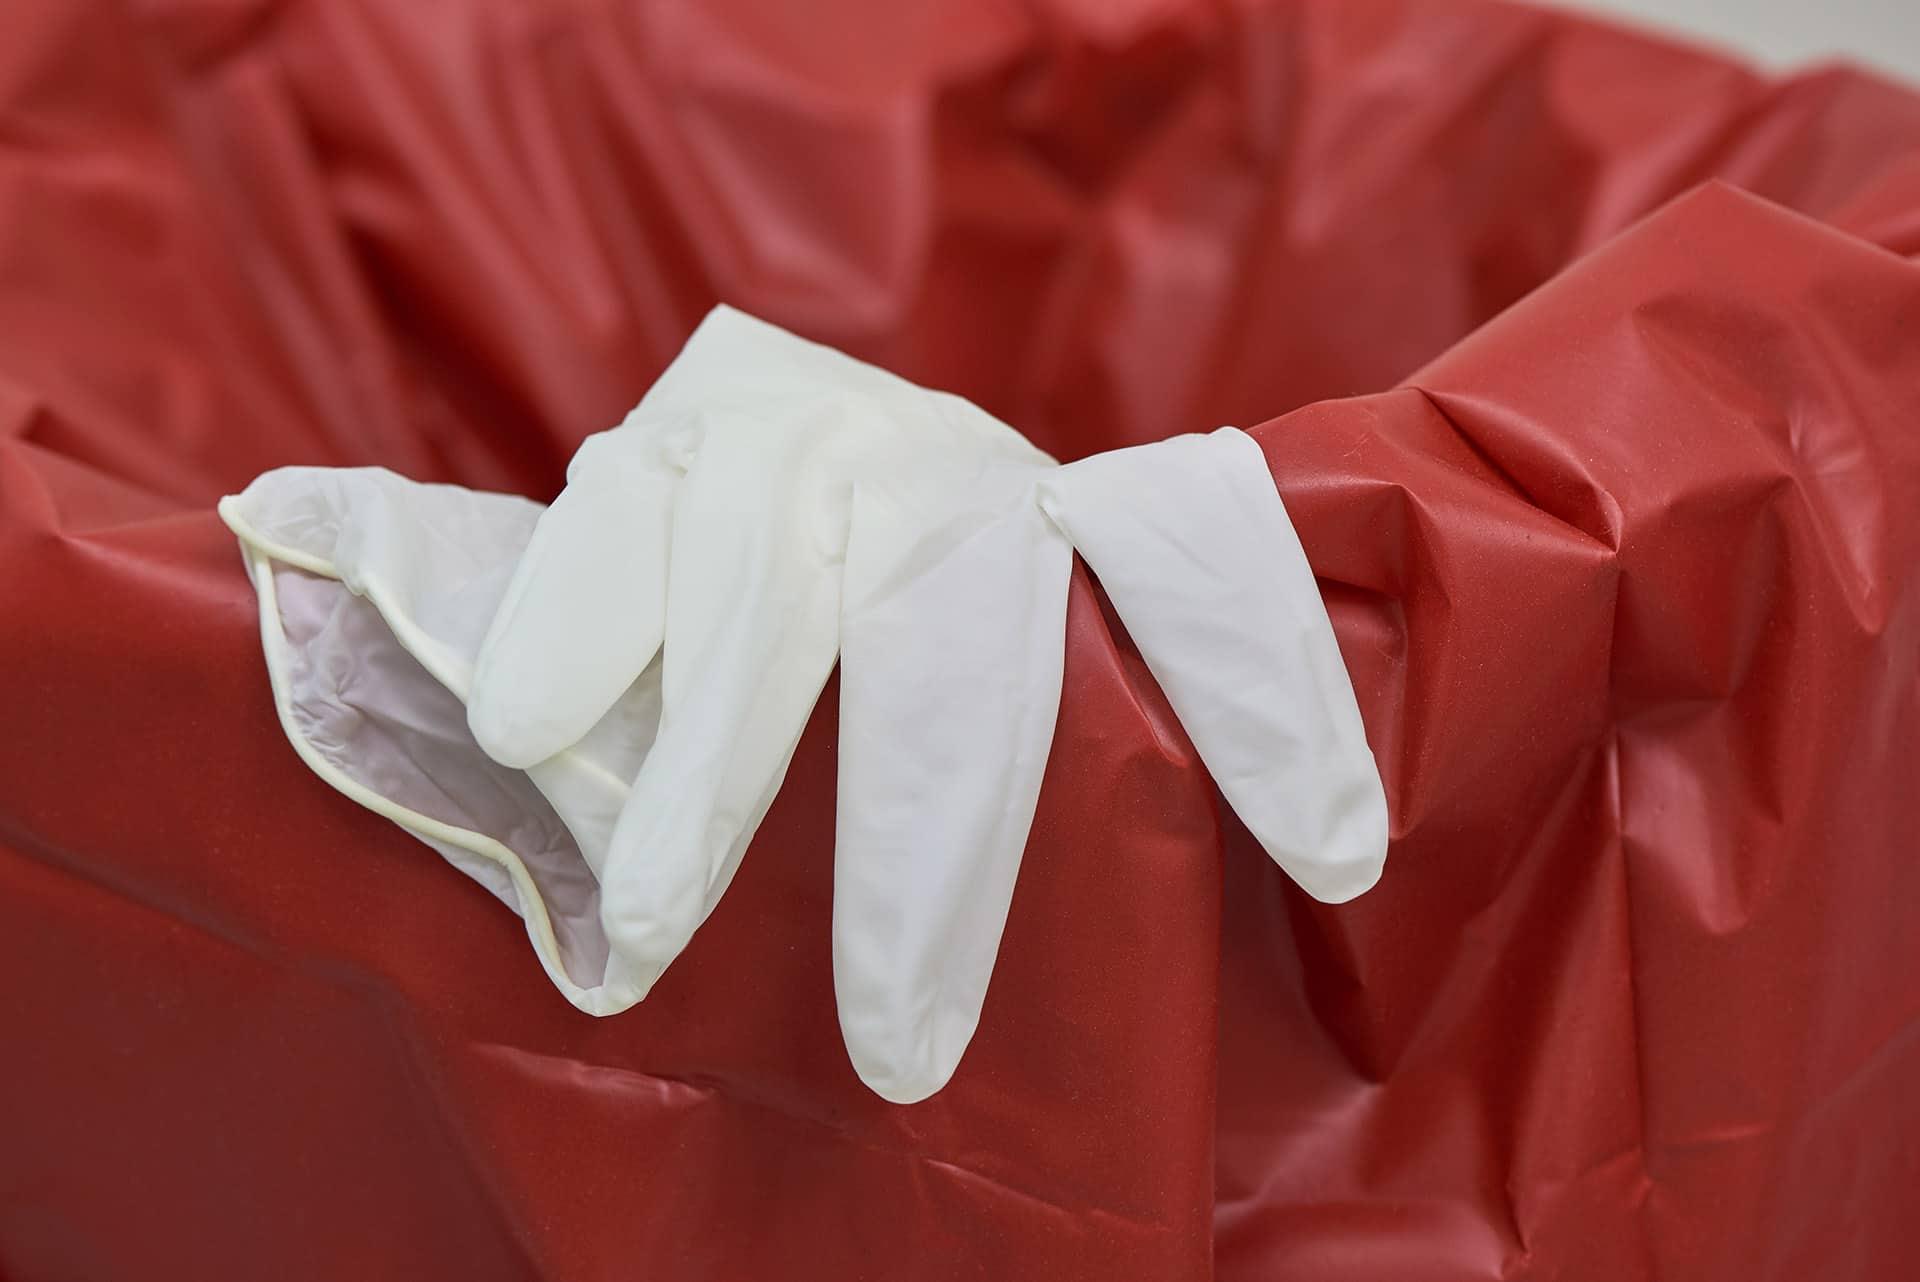 Used latex gloves